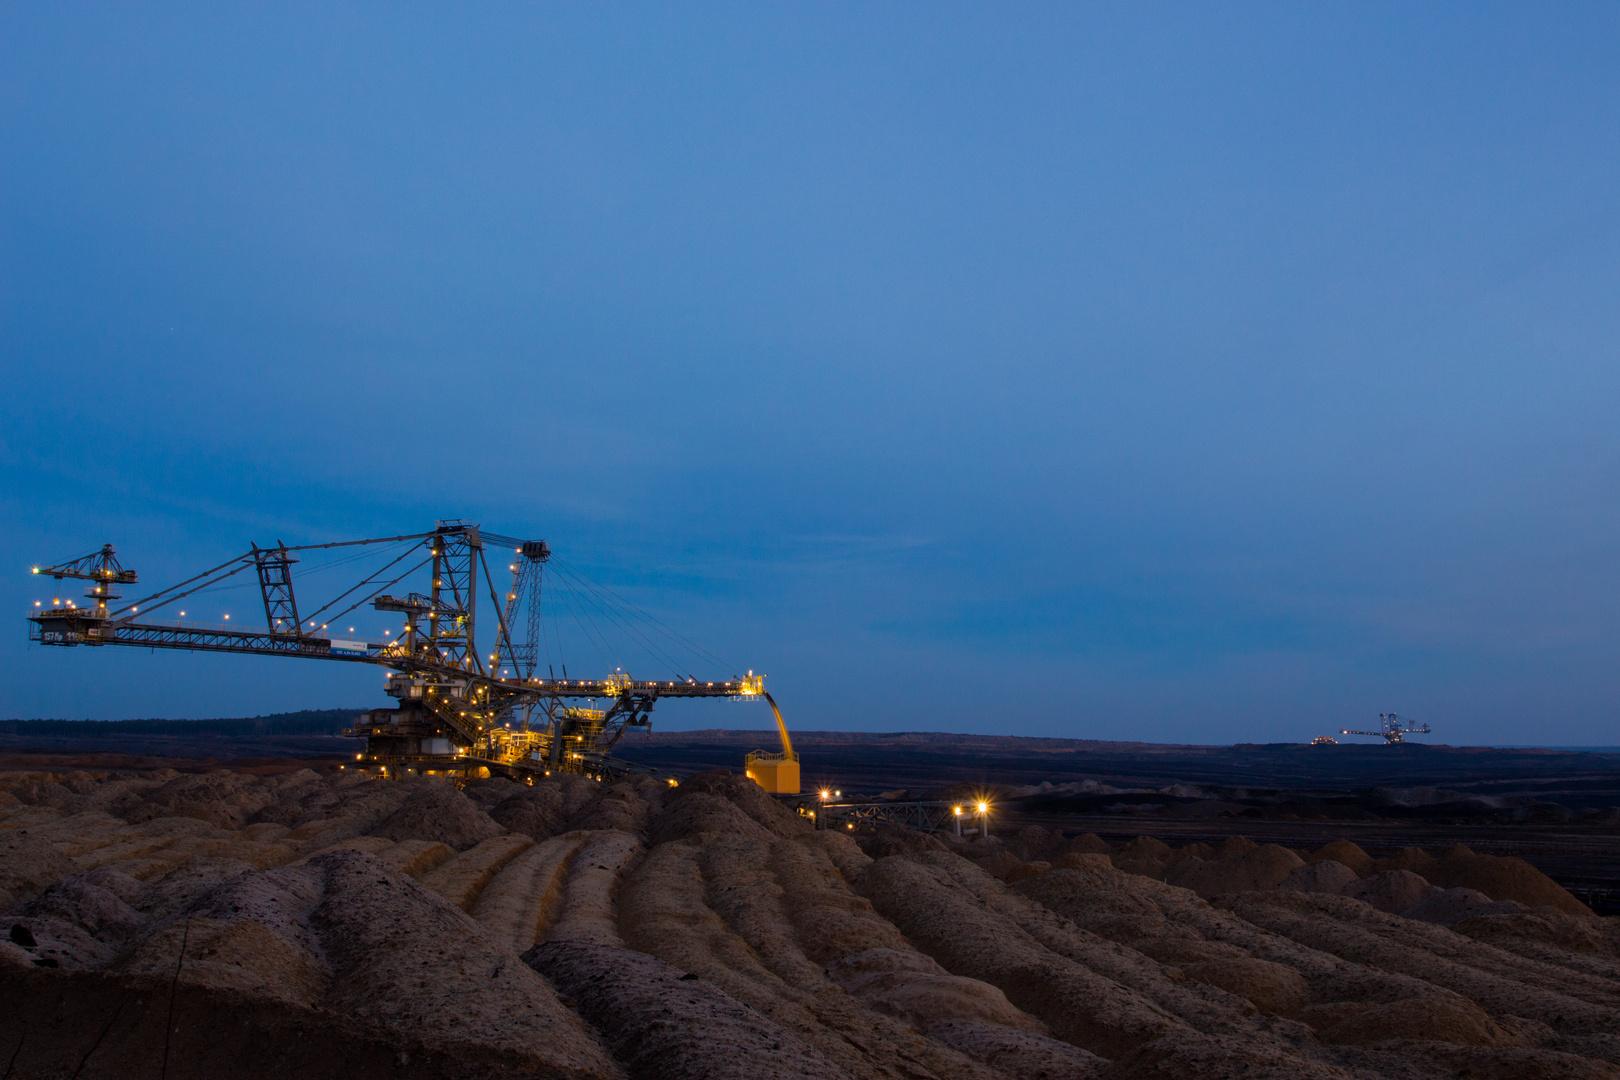 nachts im Tagebau